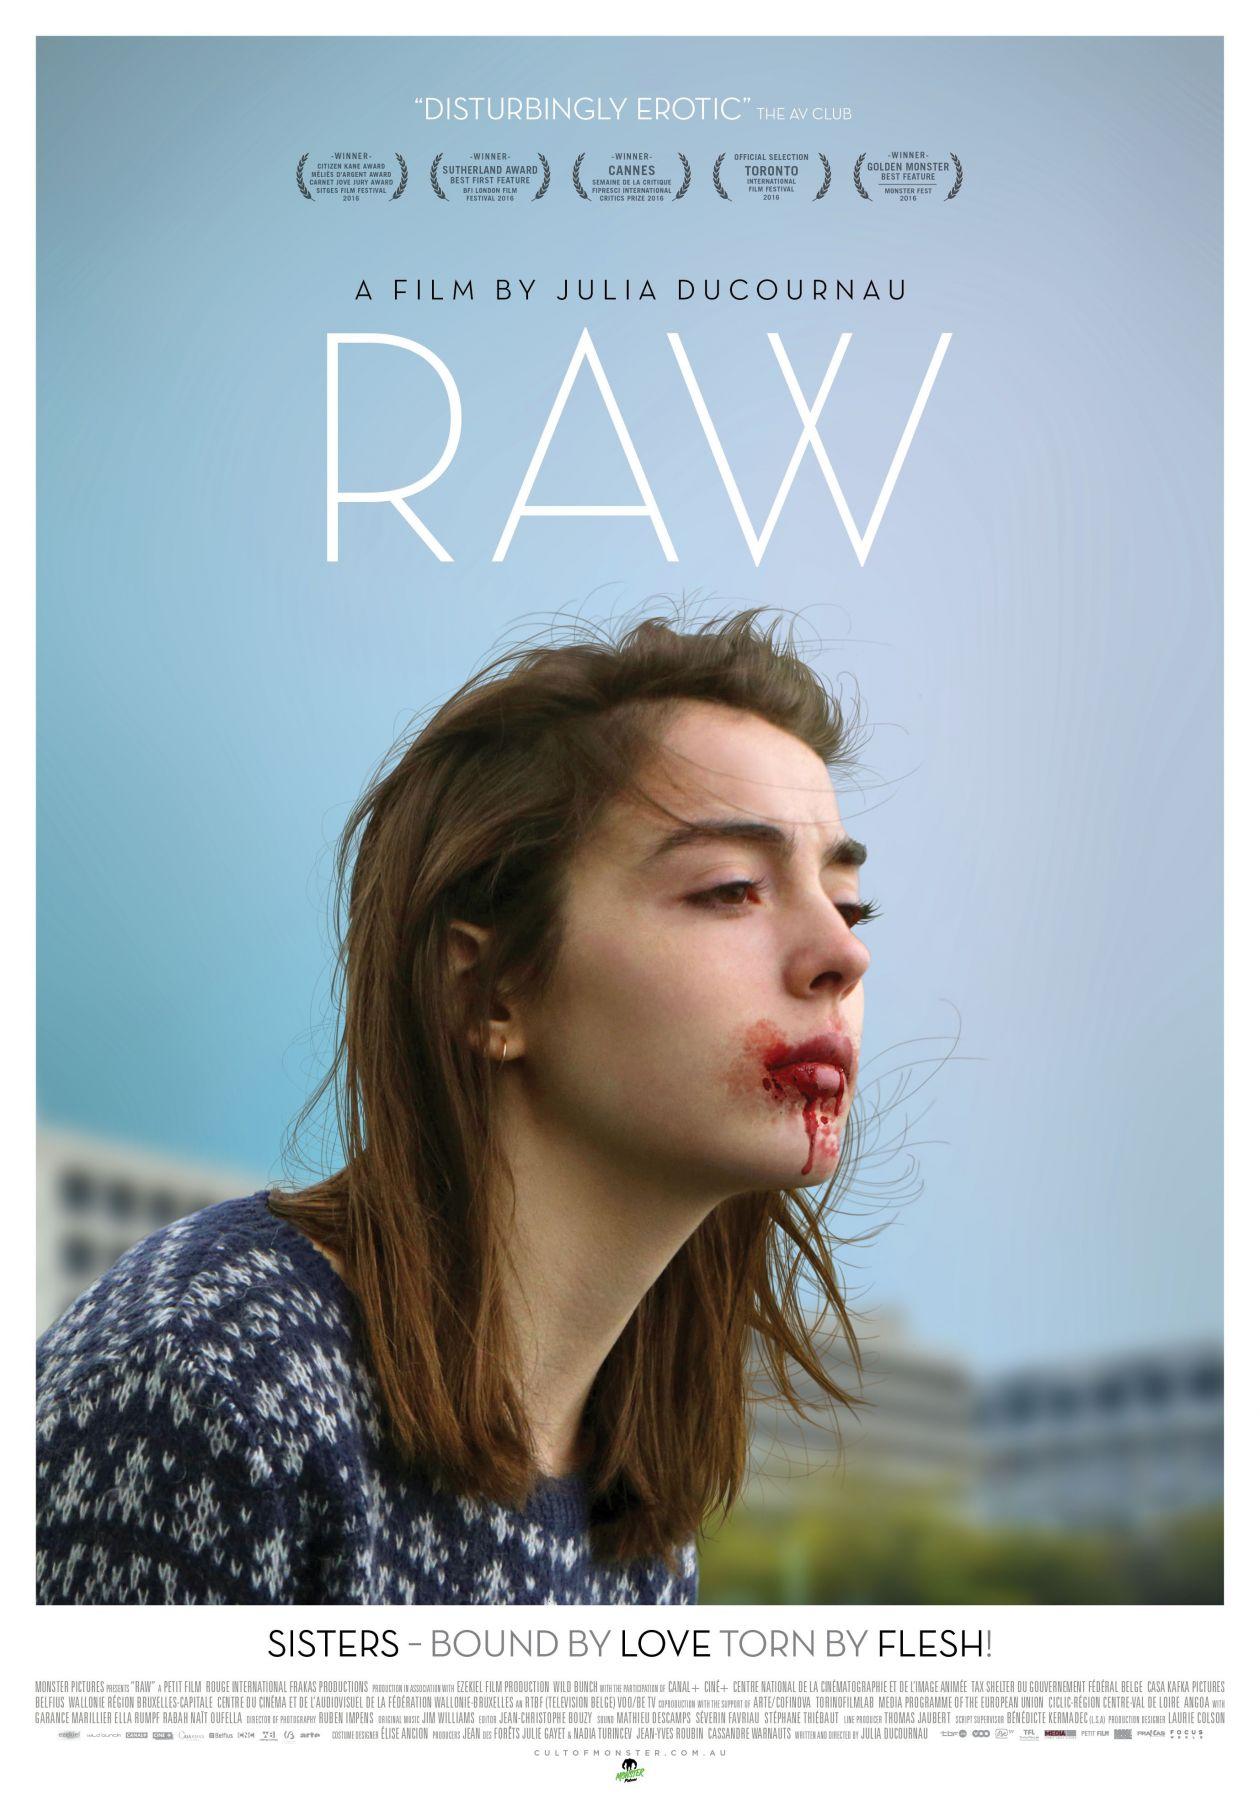 Garance Marillier French Actress actrice comédienne | Grave / Raw / Julia Ducournau 2016 / Movie Poster / Affiche du film